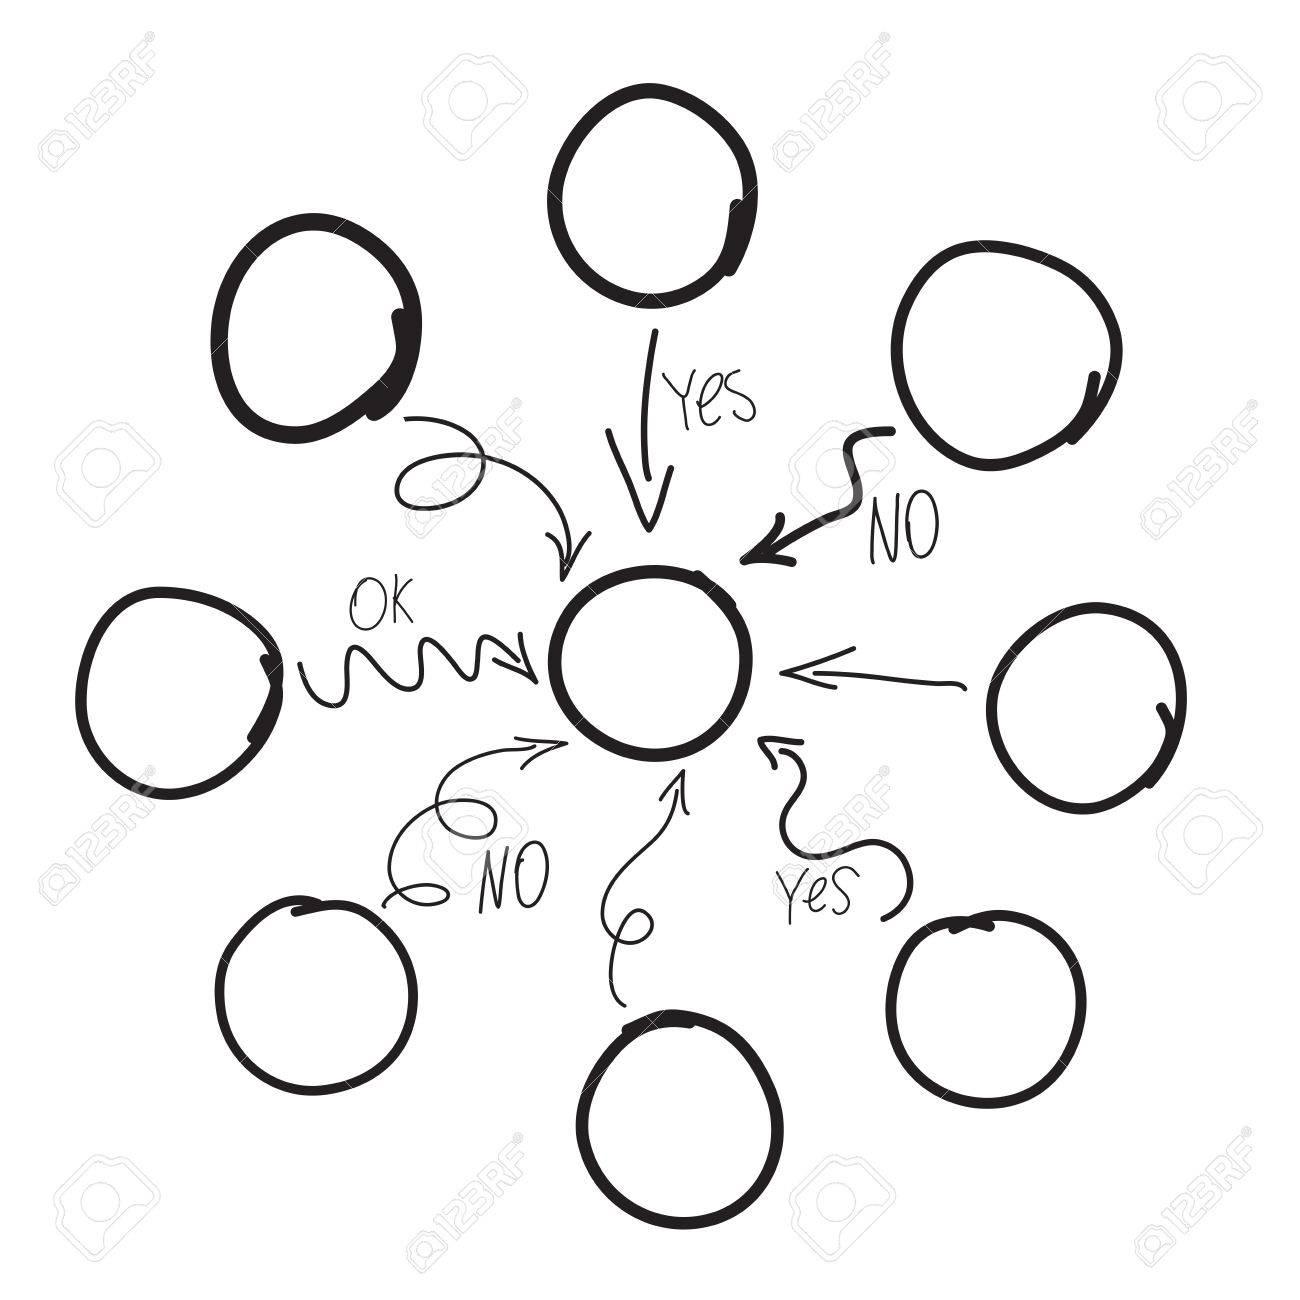 Hand drawn diagram or flowchart imitation of hand drawing of hand drawn diagram or flowchart imitation of hand drawing of mind mapping with yes ccuart Choice Image